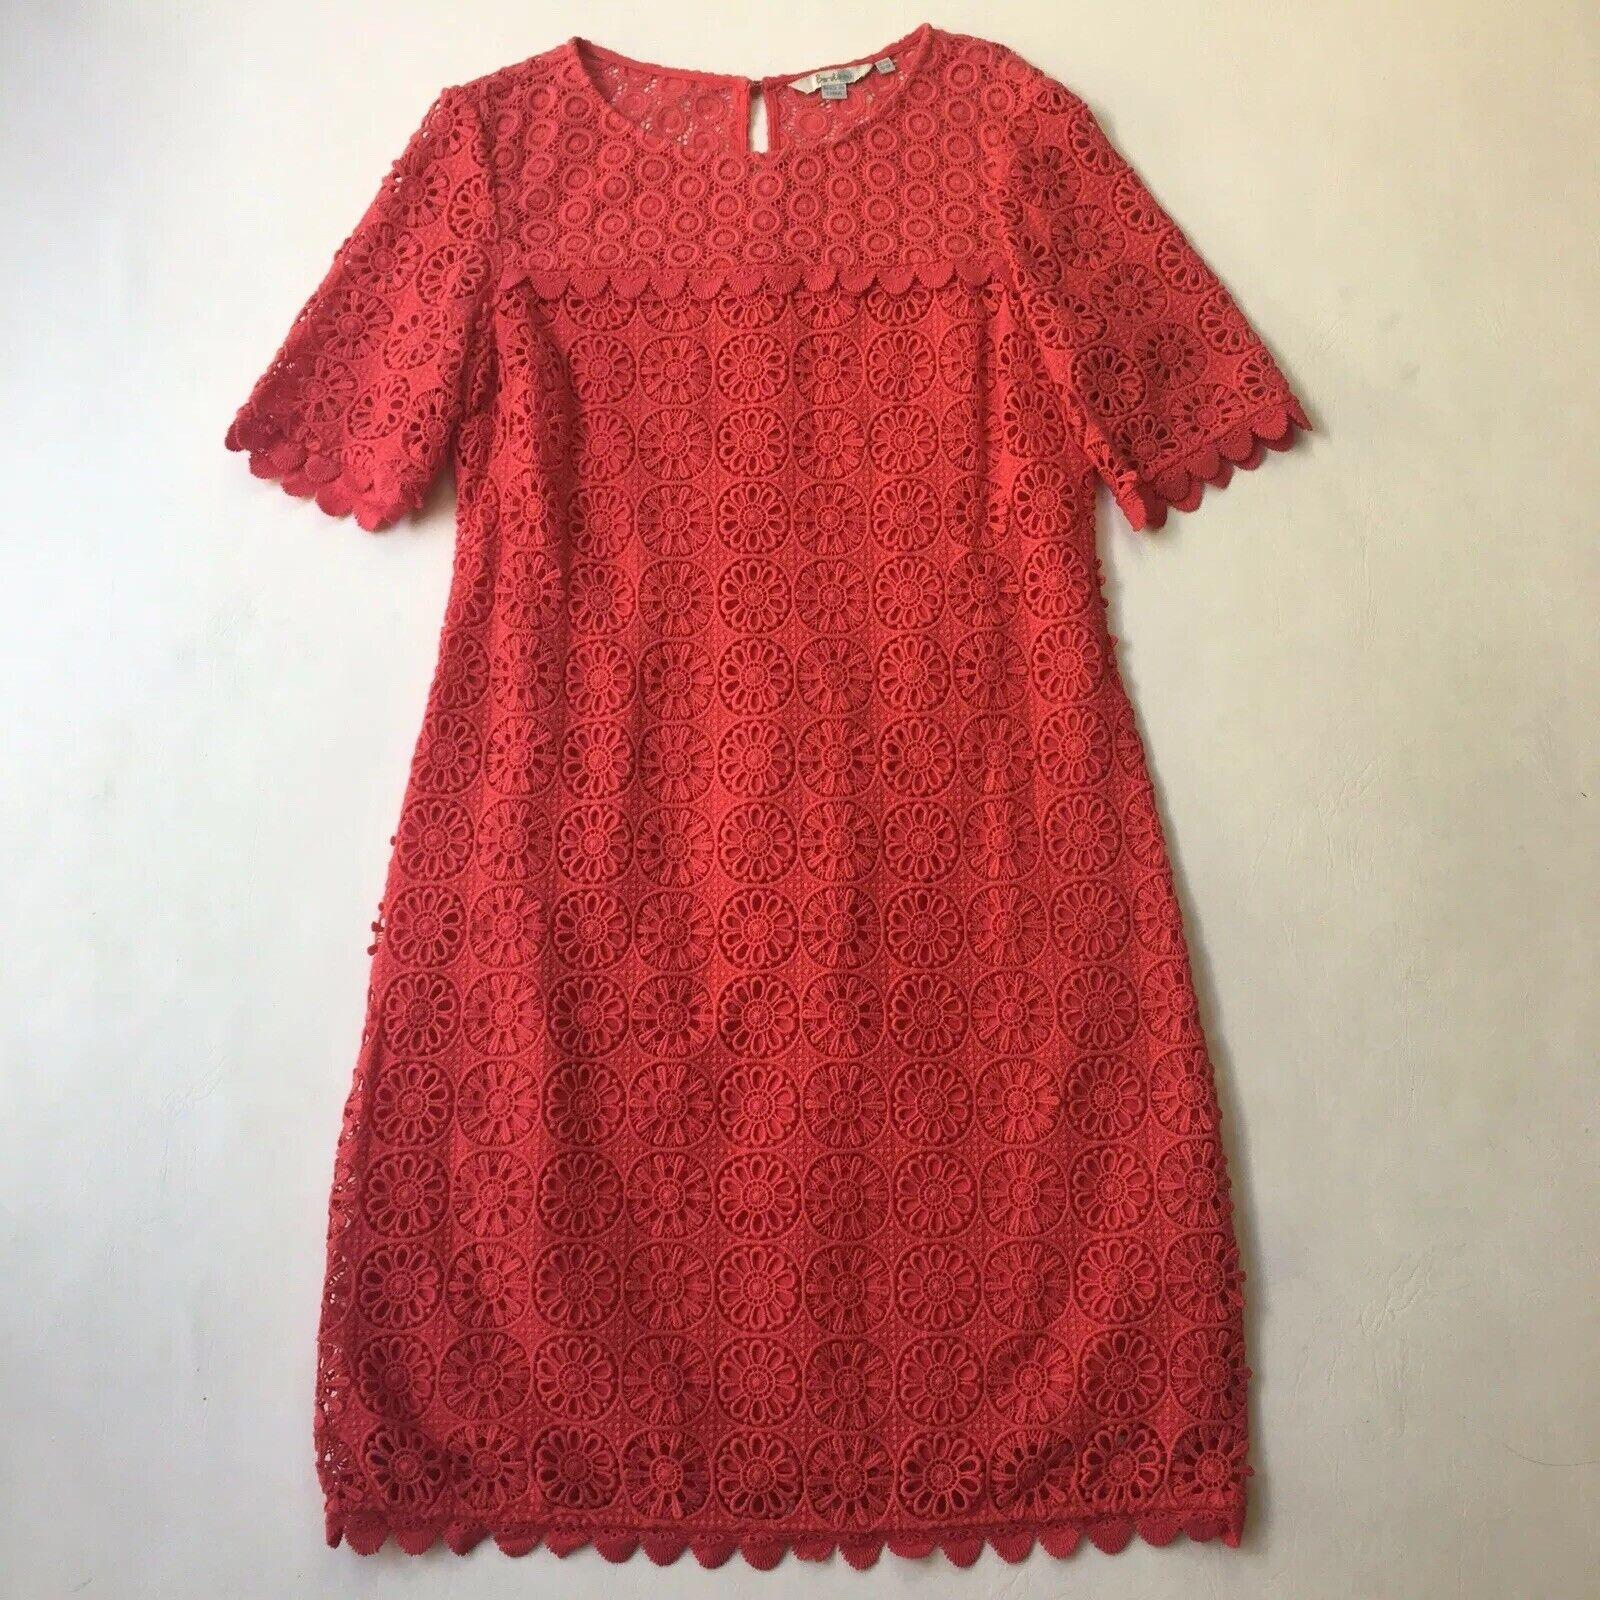 Boden Coral Eyelet Sheath Dress Crochet Scalloped Hem Easter Spring Sz 10R